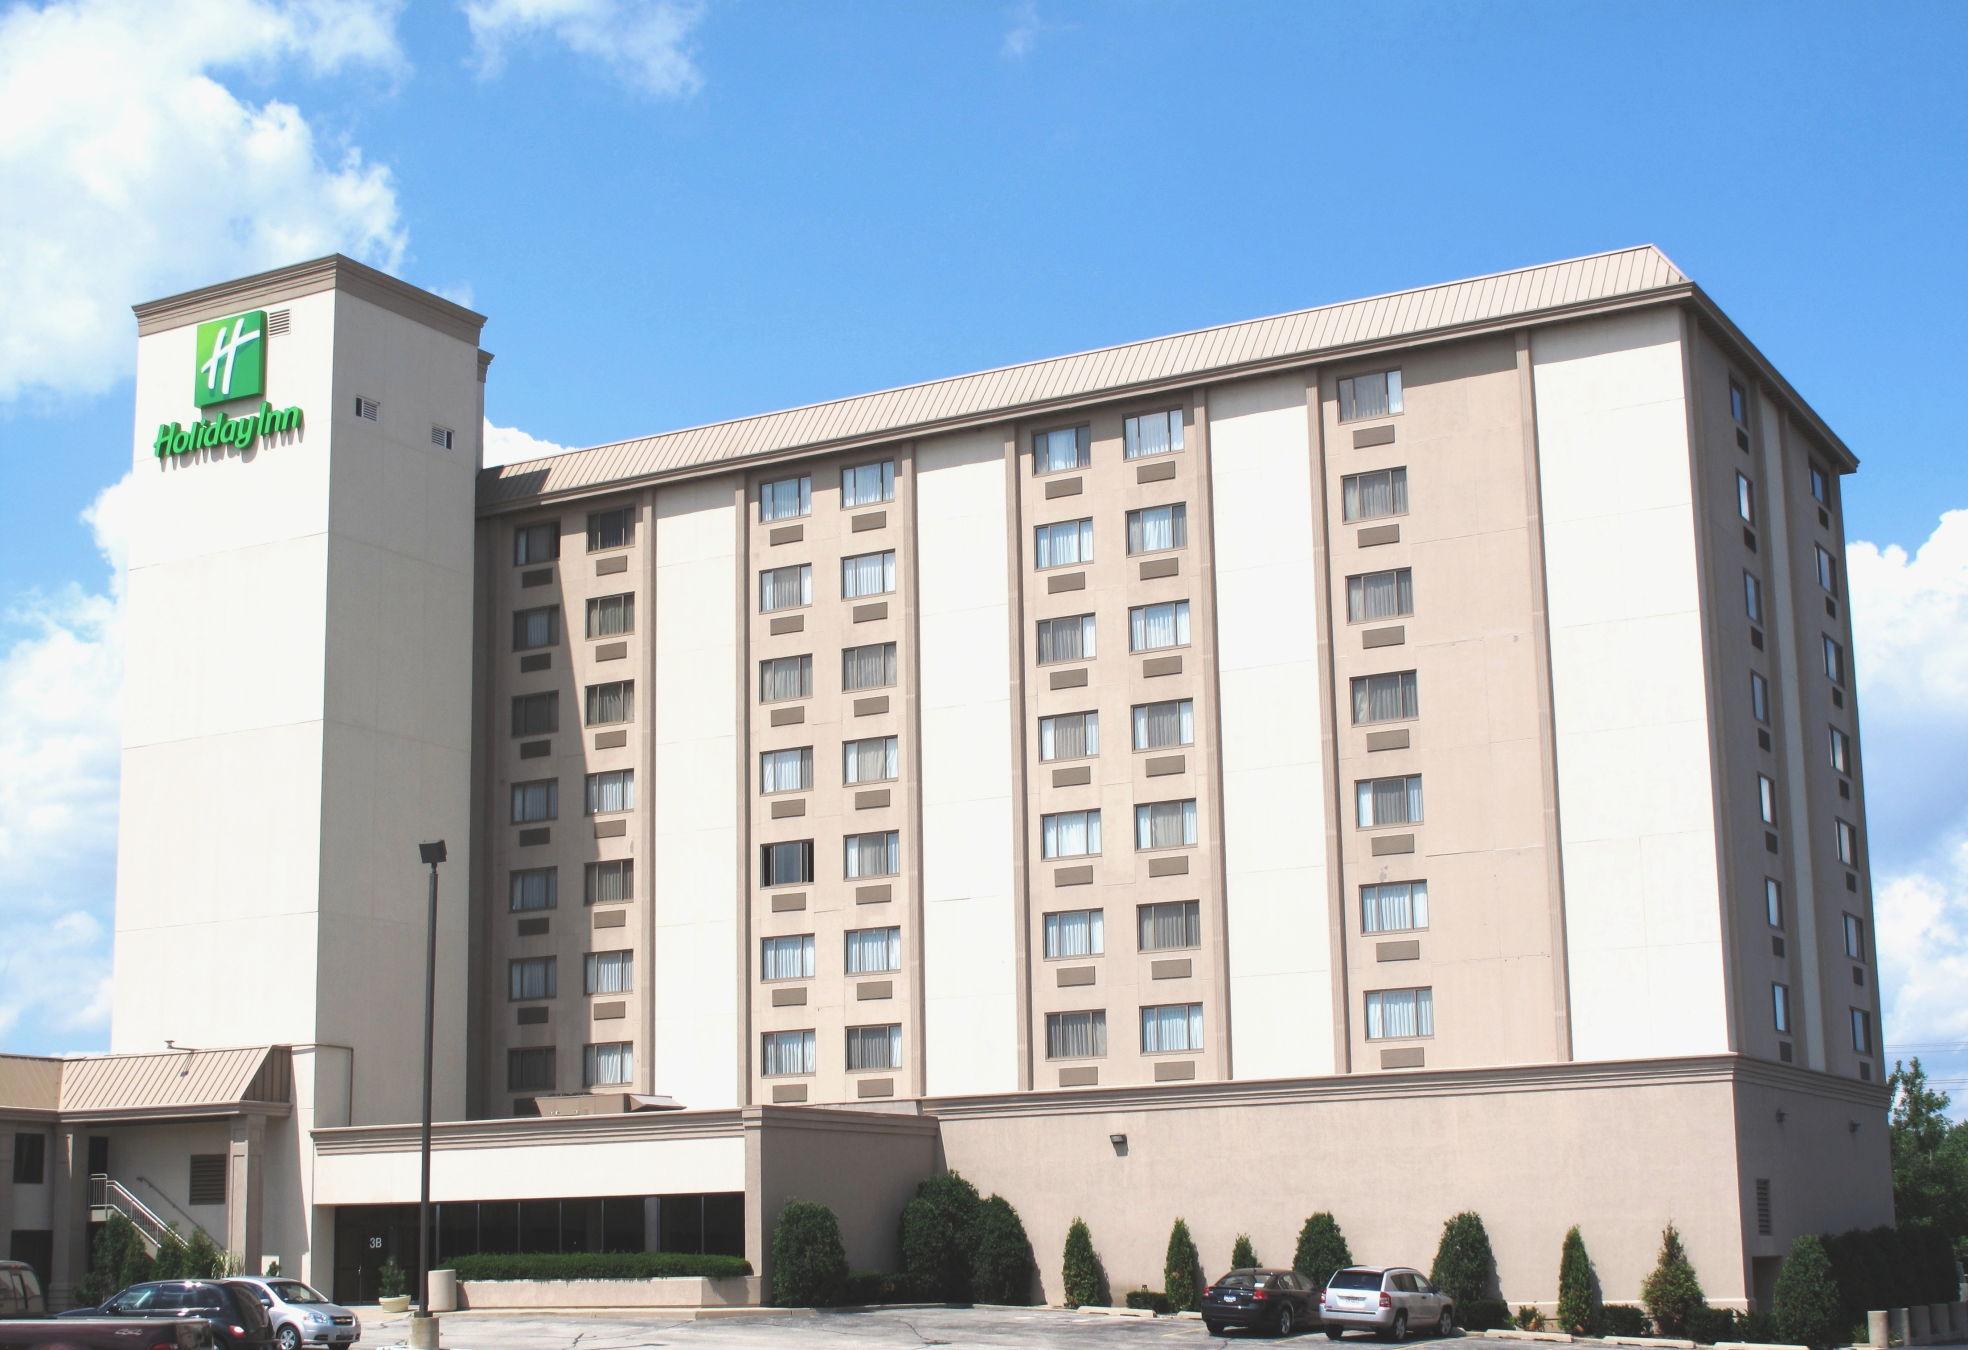 Holiday Inn ROLLING MDWS-SCHAUMBURG AREA - Rolling Meadows, IL